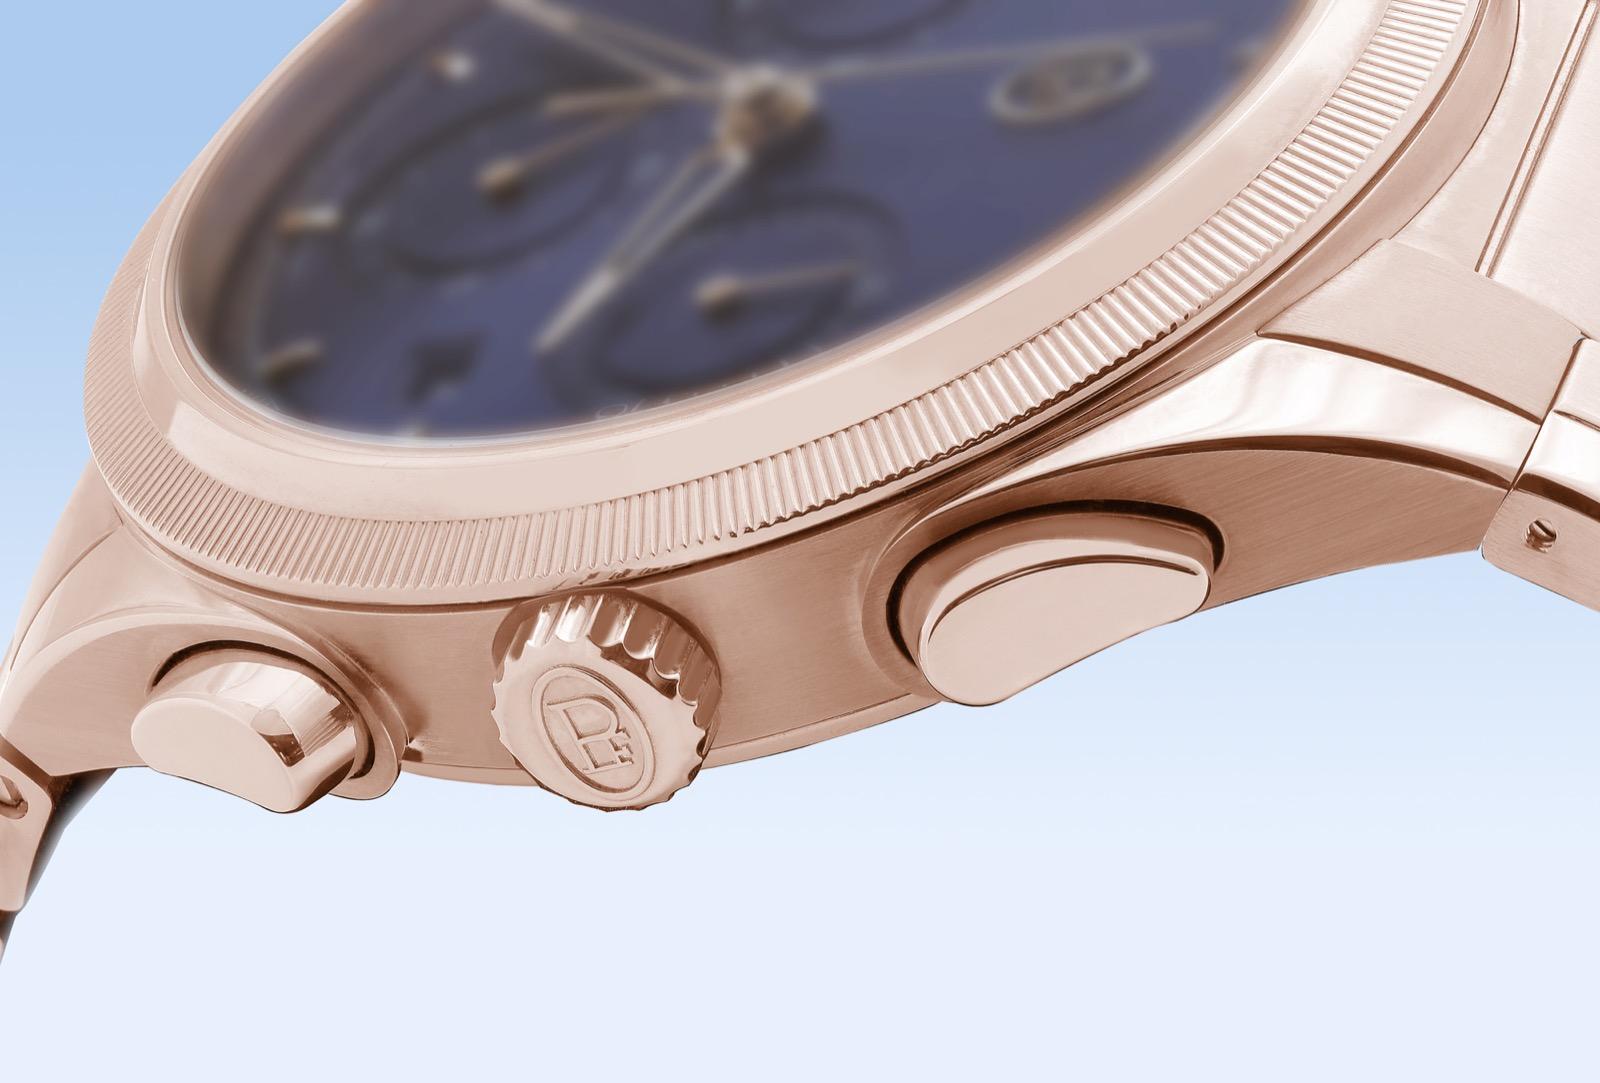 Parmigiani Fleurier Tonda PF Chronograph